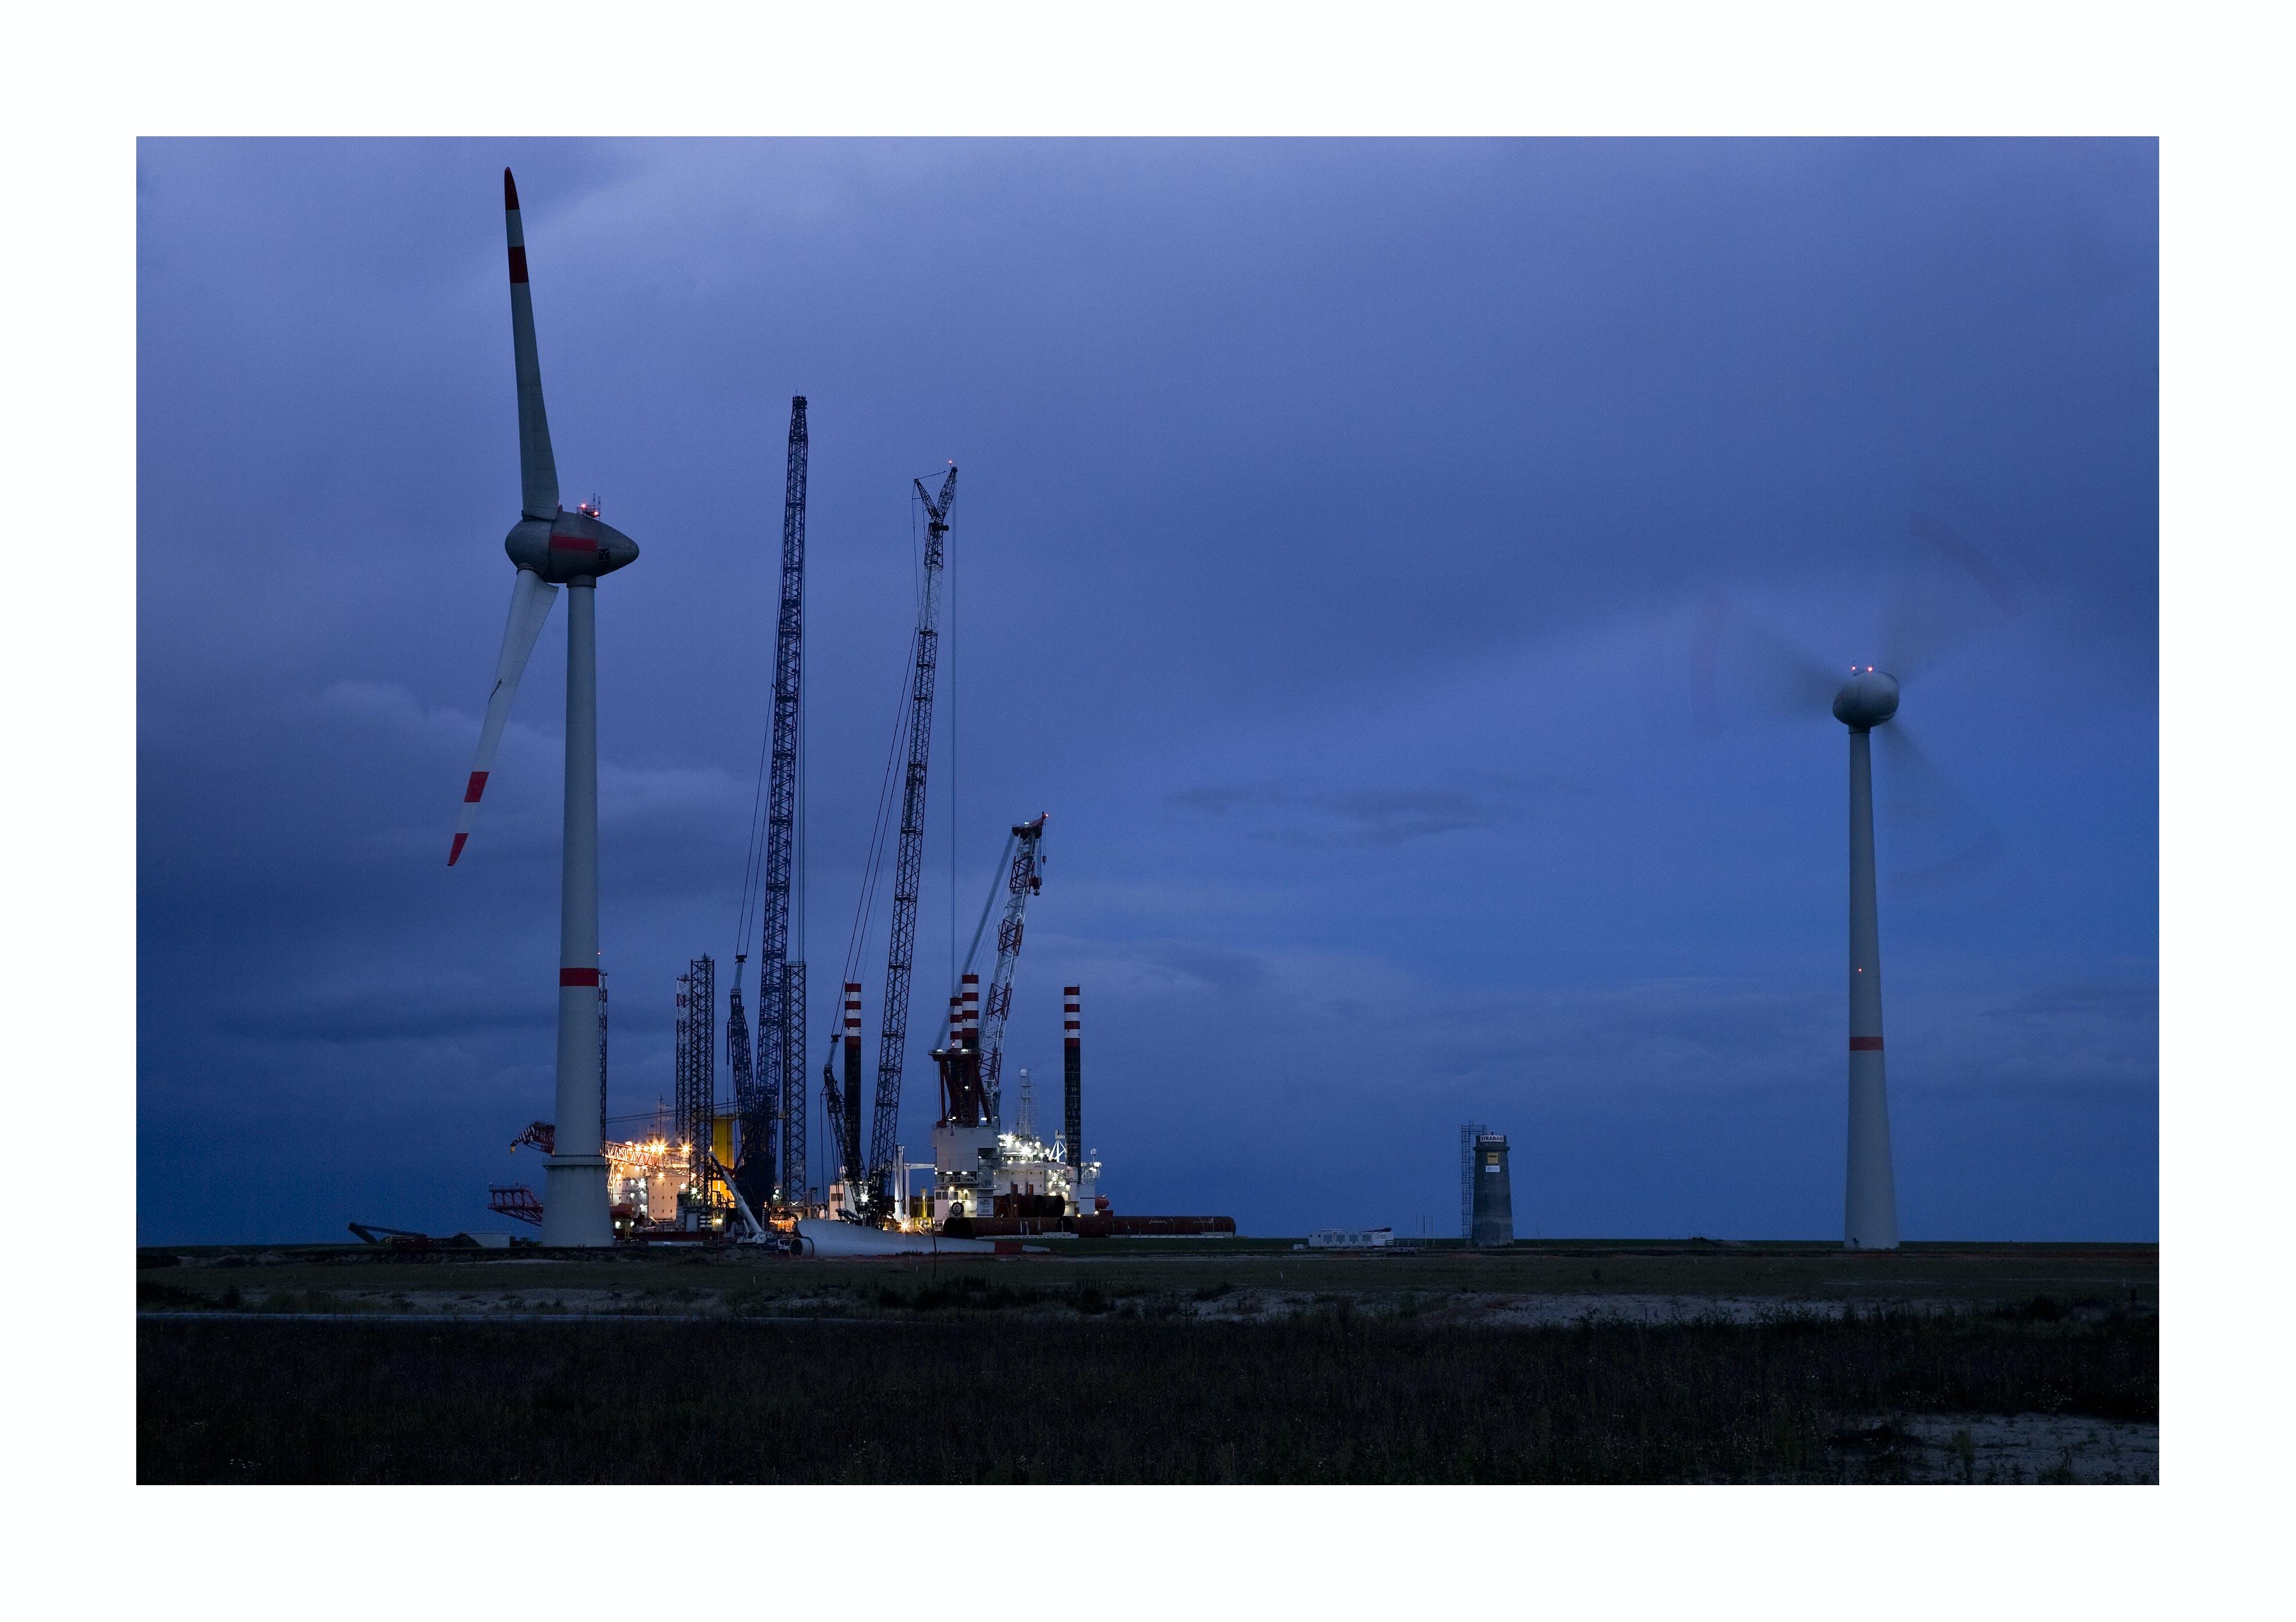 Free stock photo of wind energy